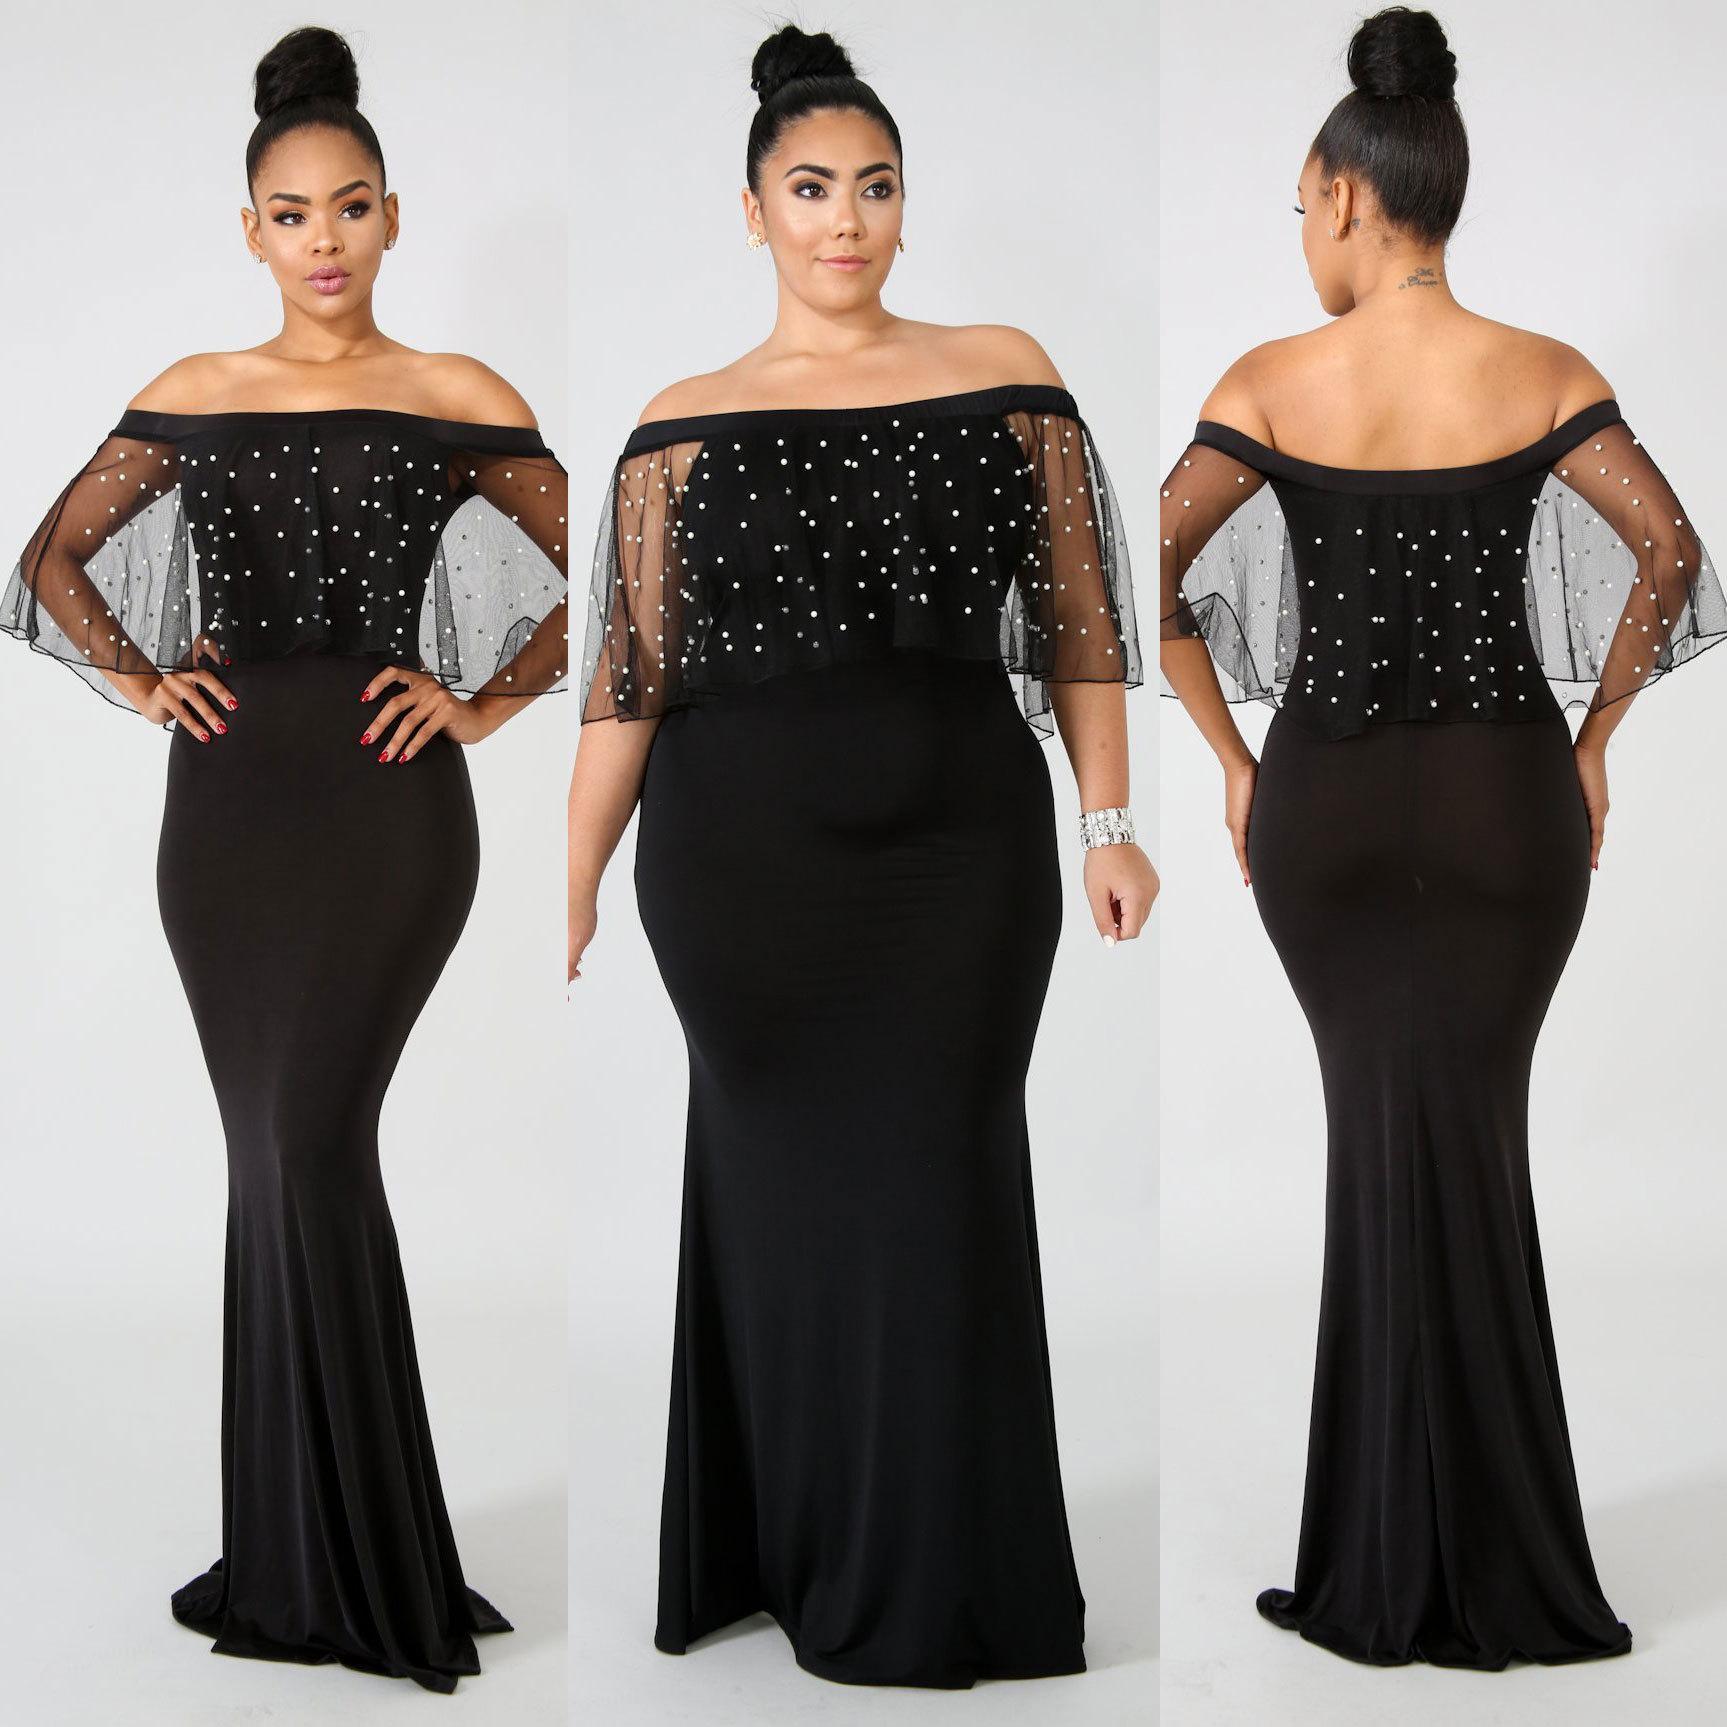 Perle a collo tondo Mesh Ruffles Women Long Mermaid Dresses Vestidos Black Off Shoulder Piano Lunghezza Maxi Party Dress